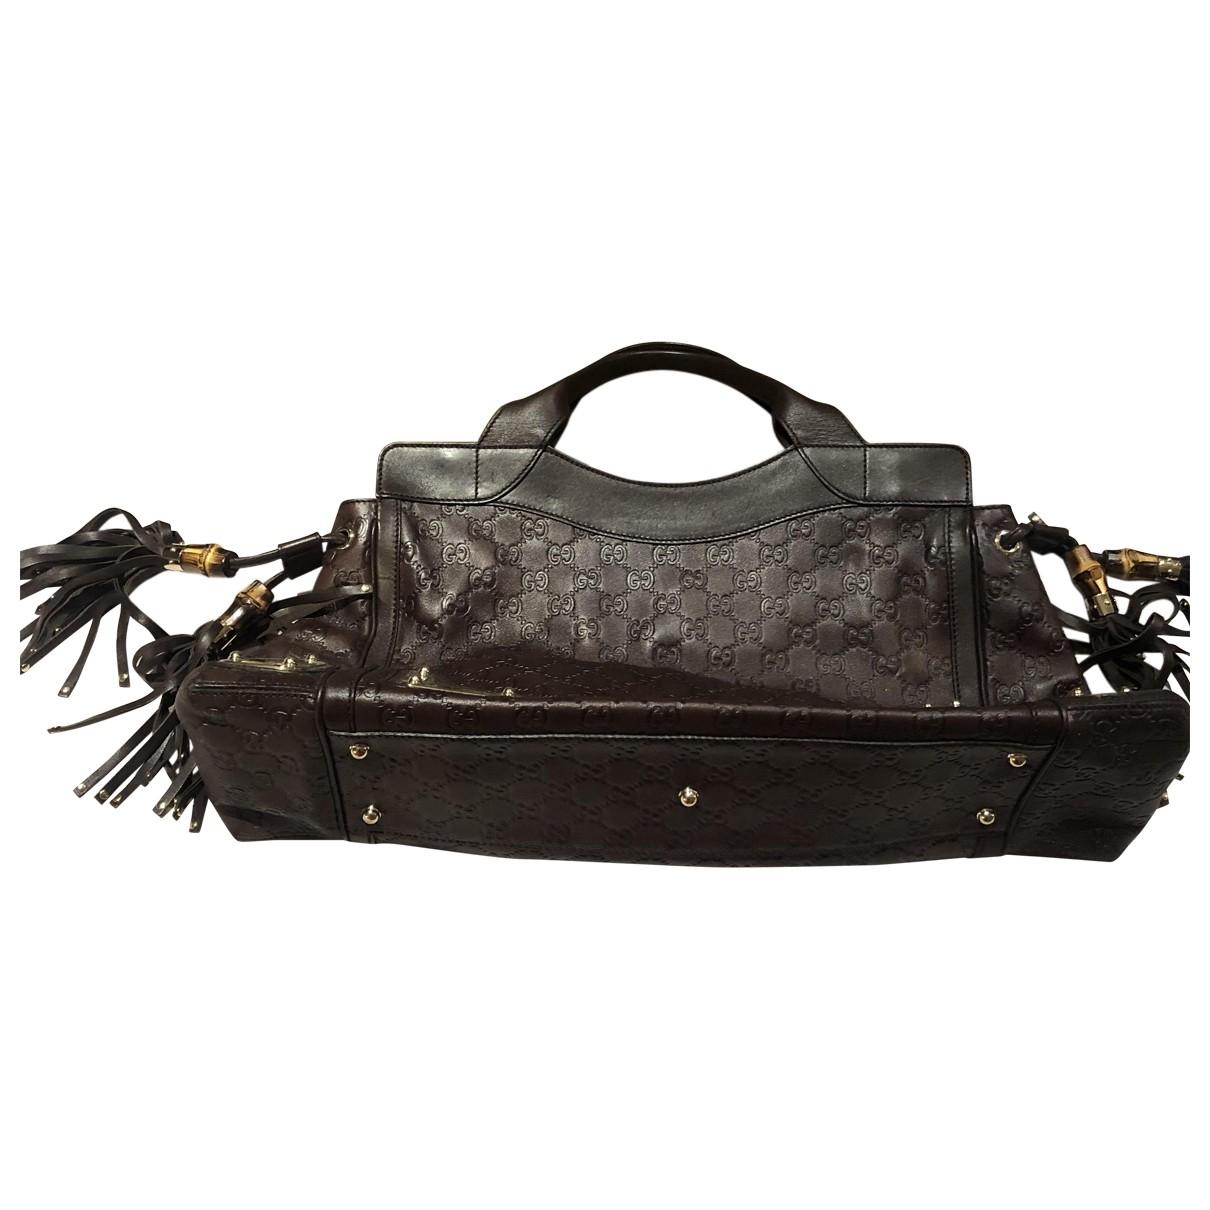 Gucci \N Burgundy Leather handbag for Women \N